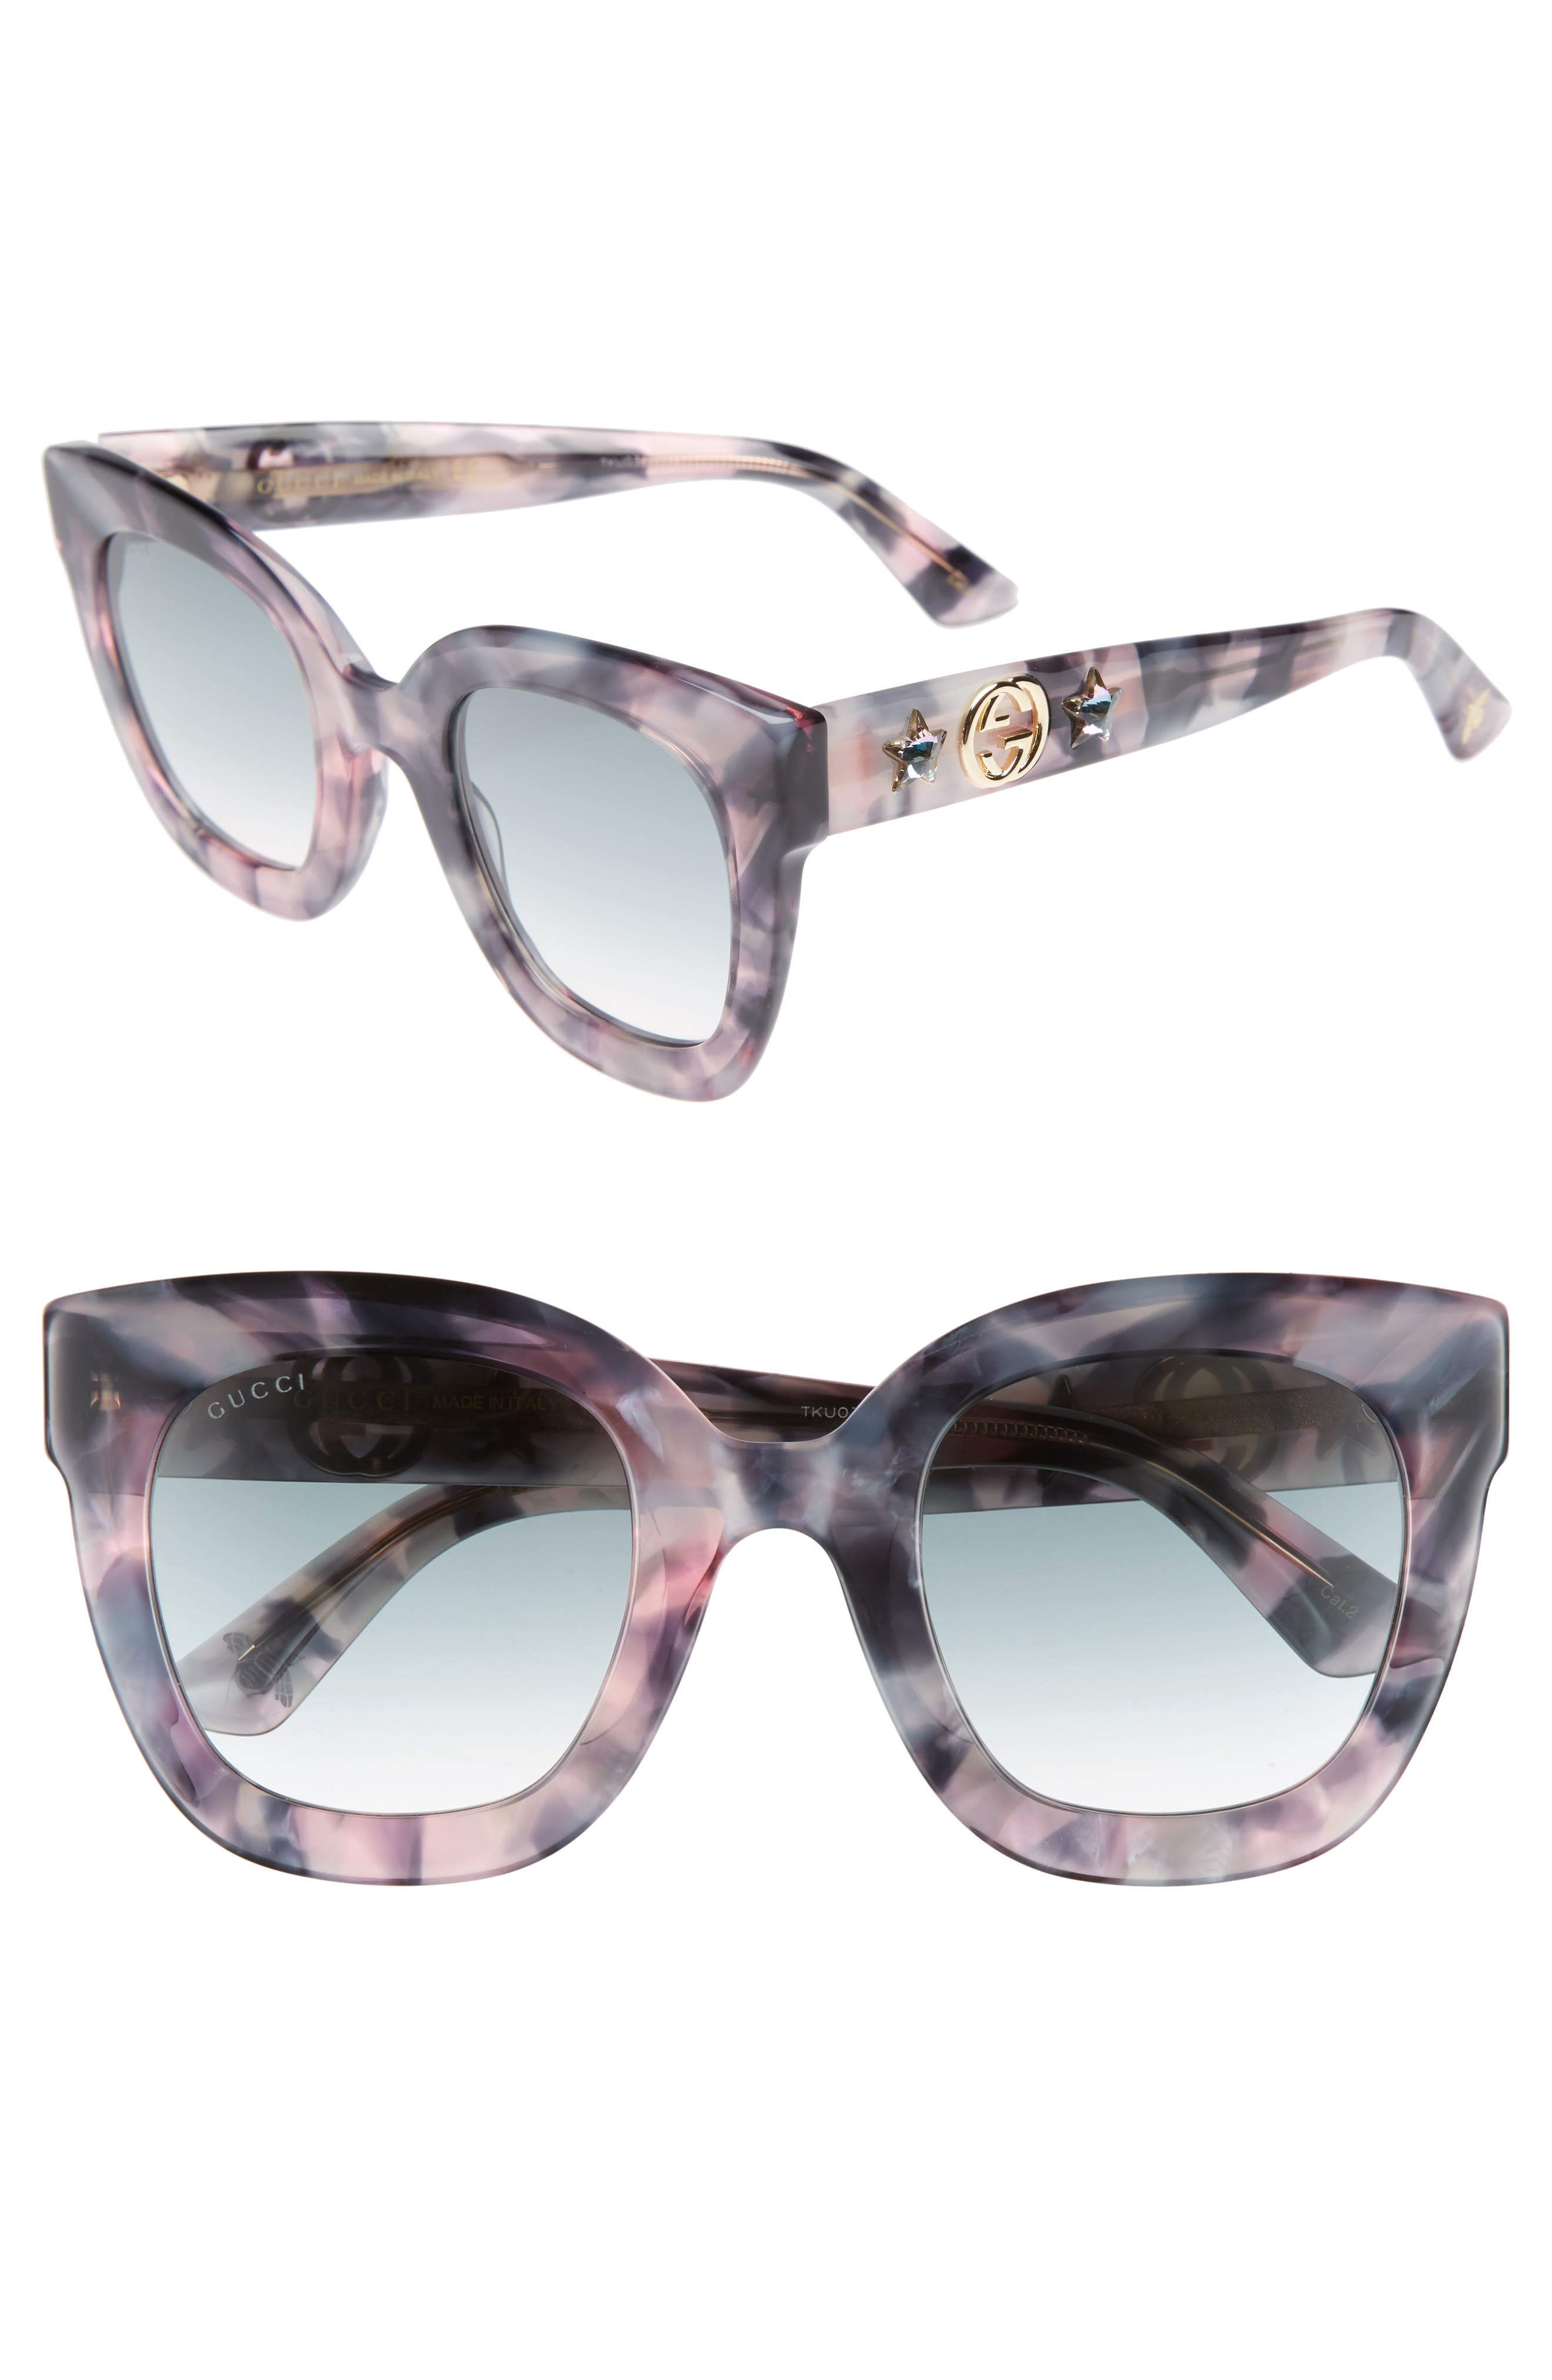 49mm Cat Eye Sunglasses,                         Main,                         color, Havana